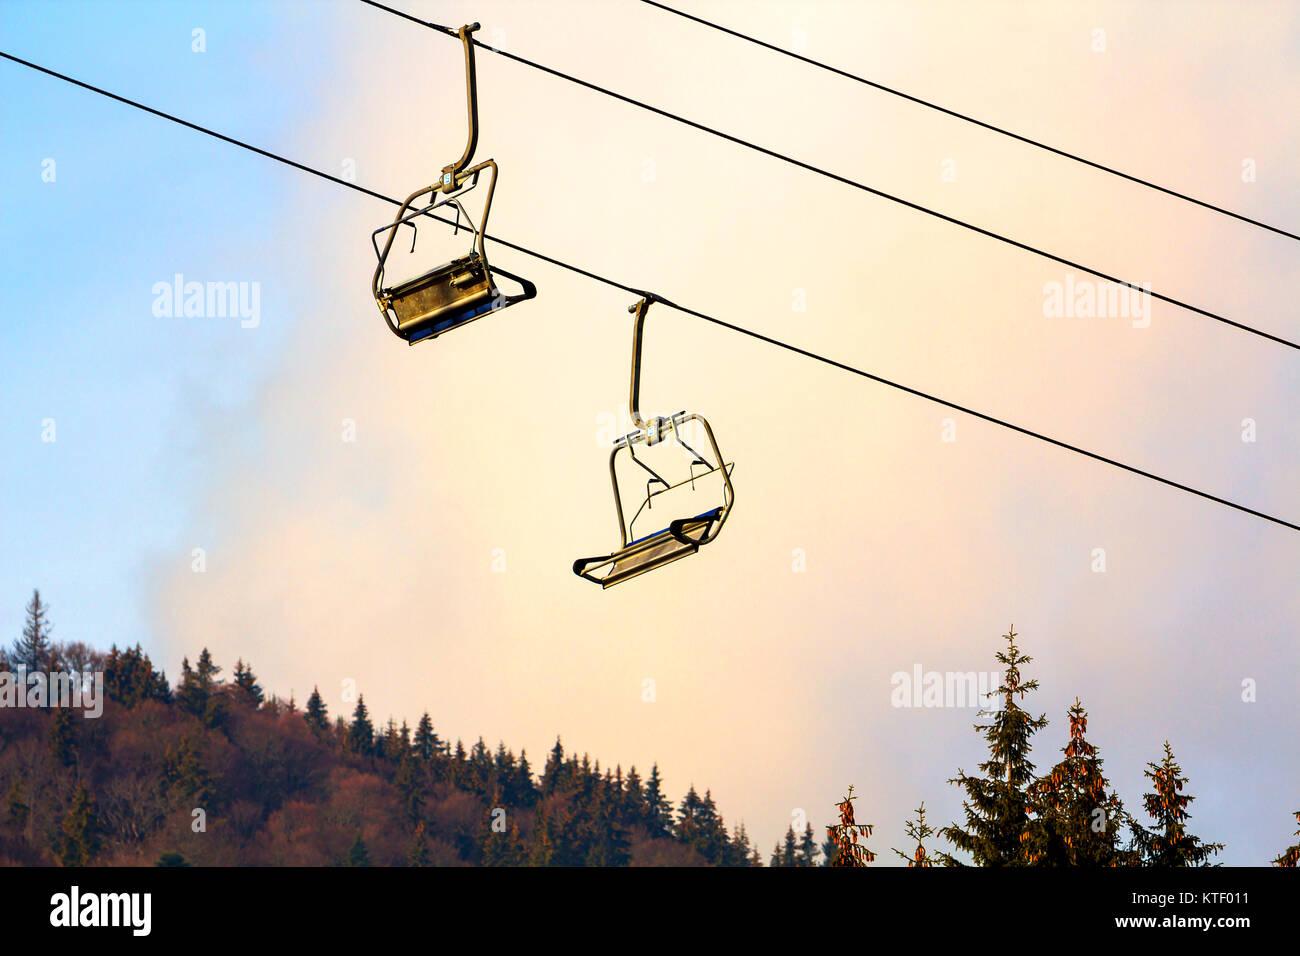 Ski lift with empty seats in ski resort Stock Photo: 169974365 - Alamy